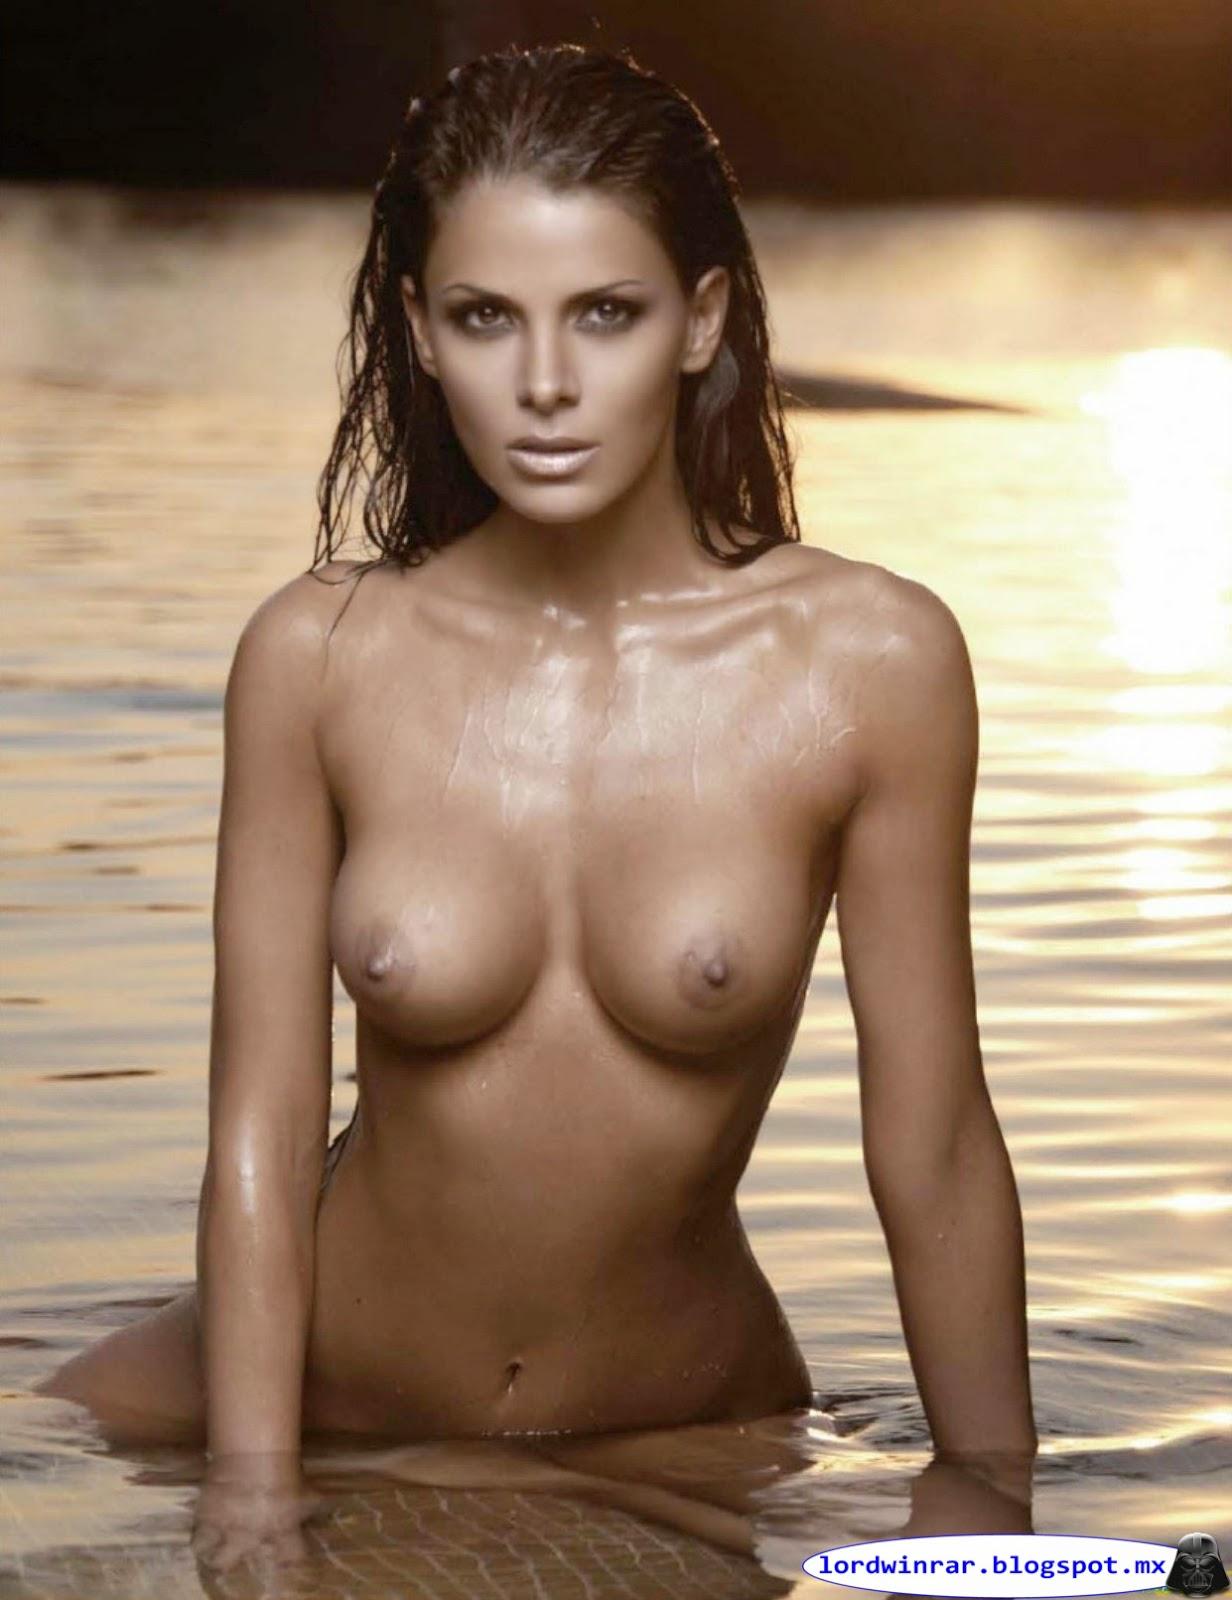 female professional athletes nude